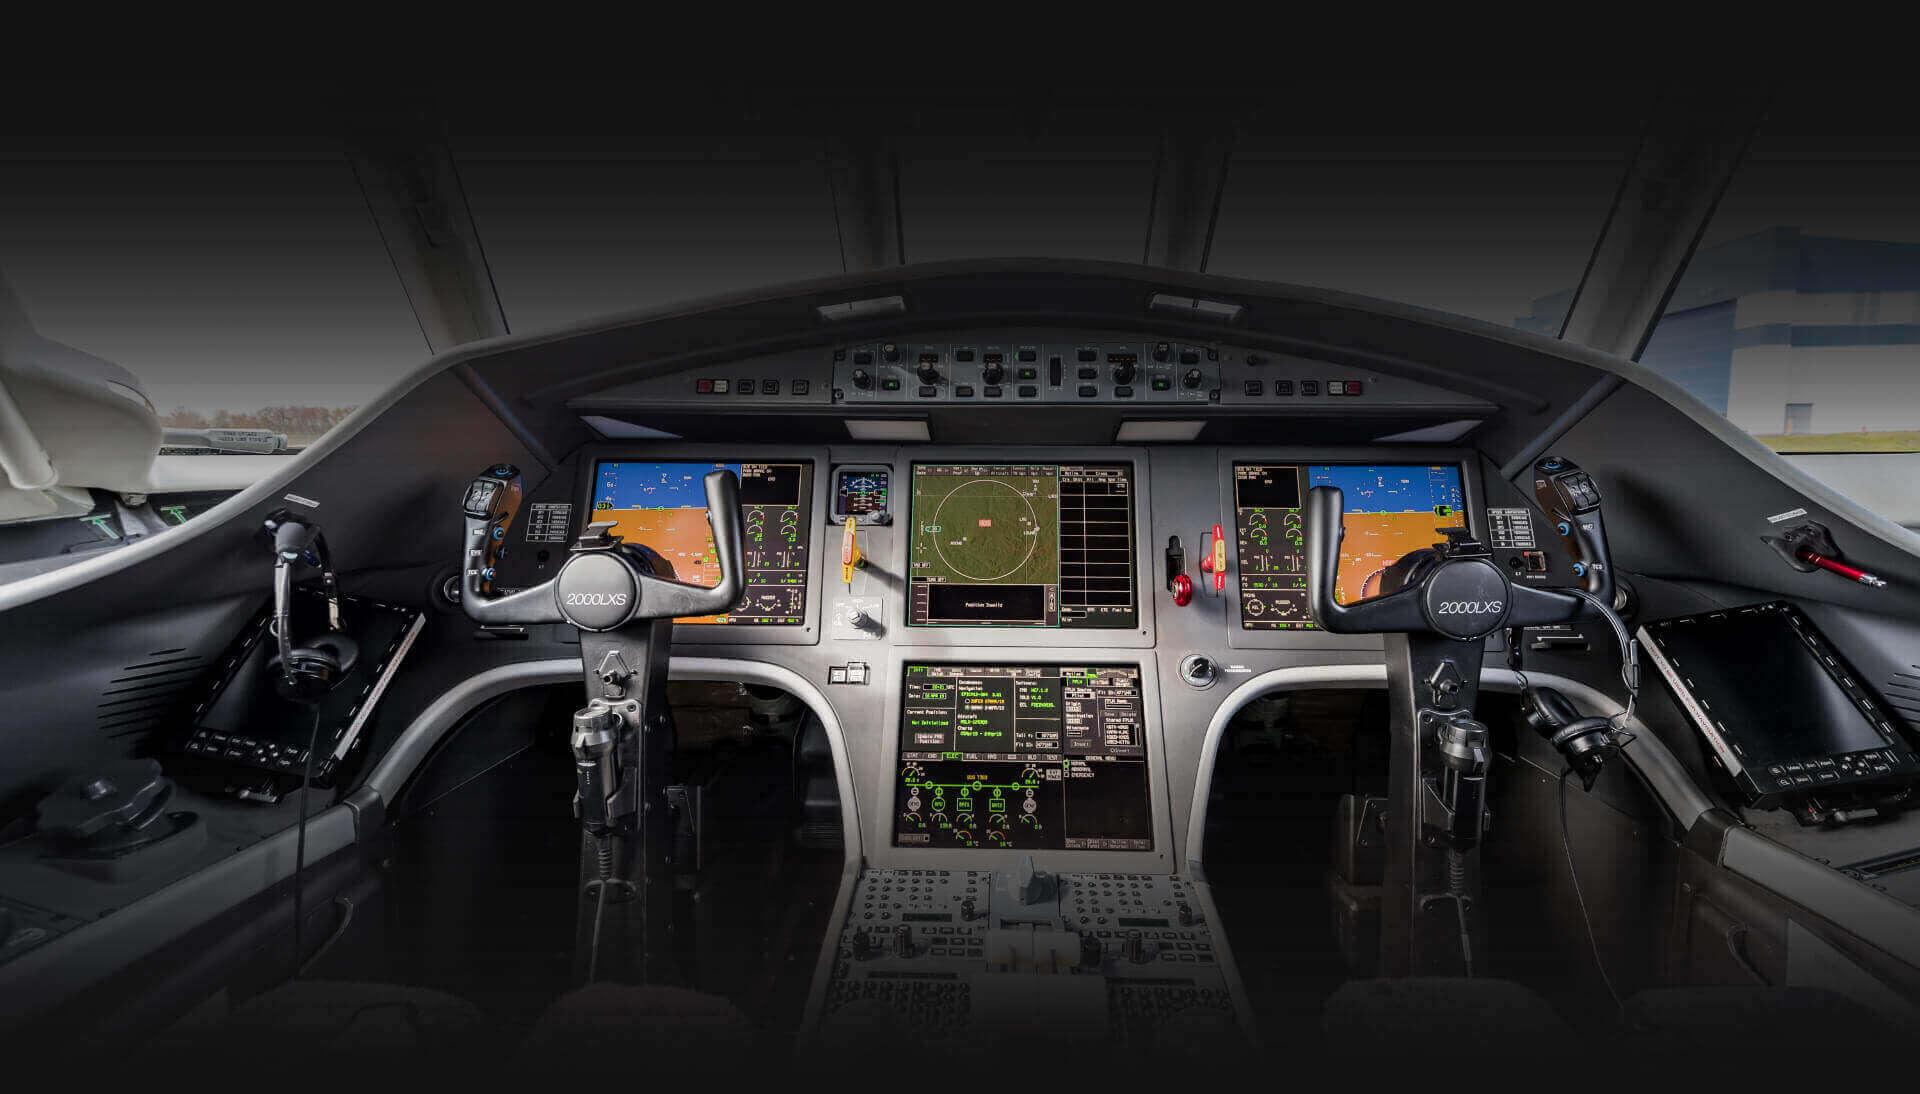 Falcon 2000LXS Aircraft Interior Details